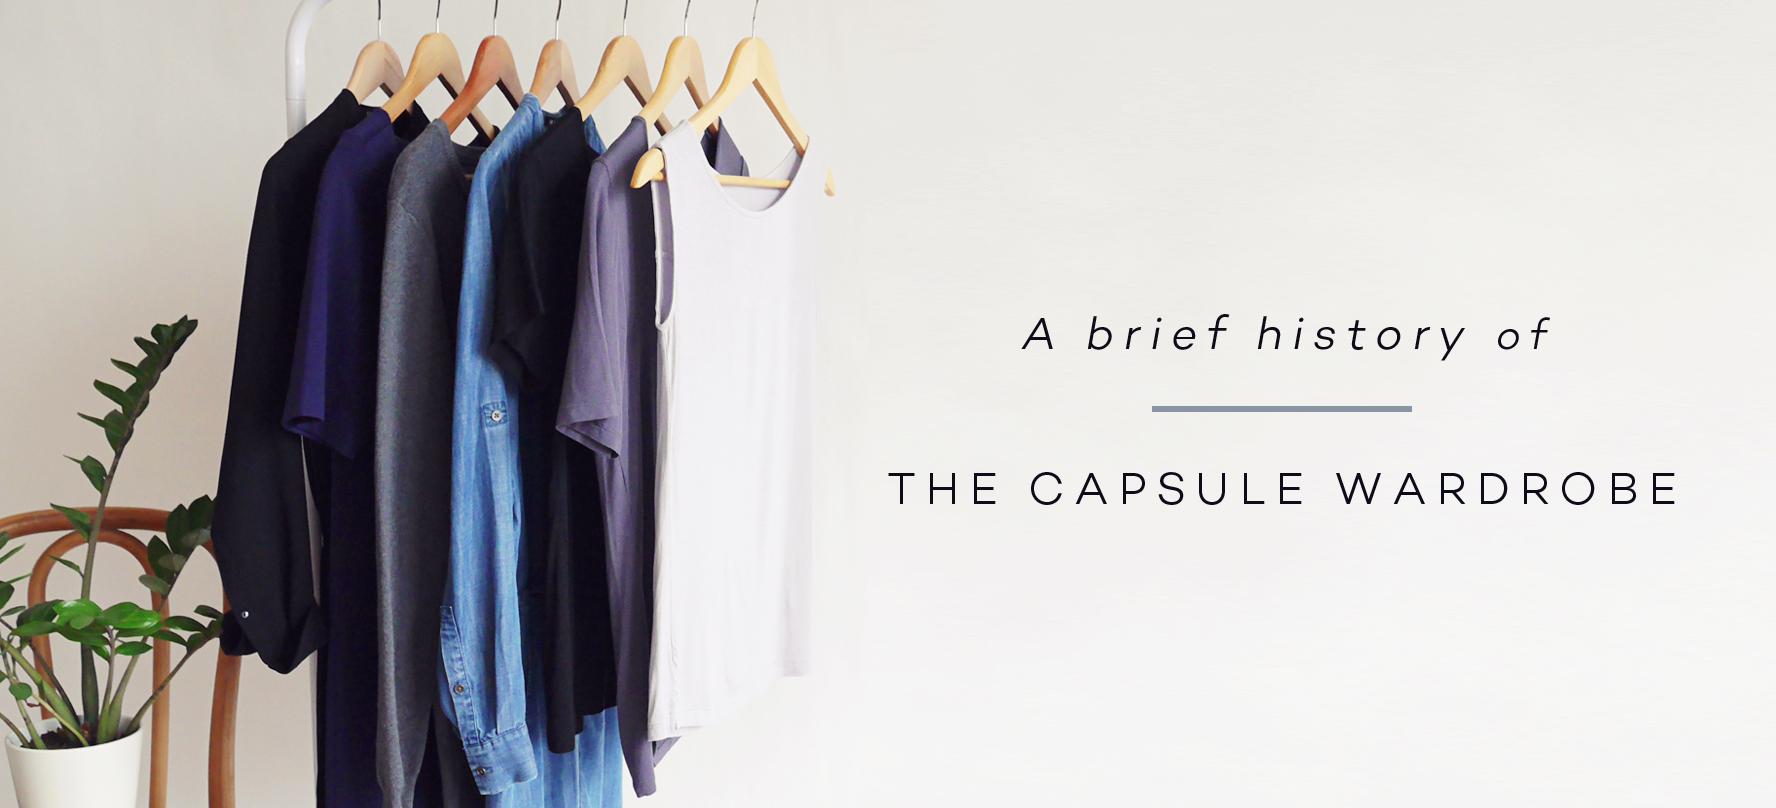 A Brief History Of The Capsule Wardrobe